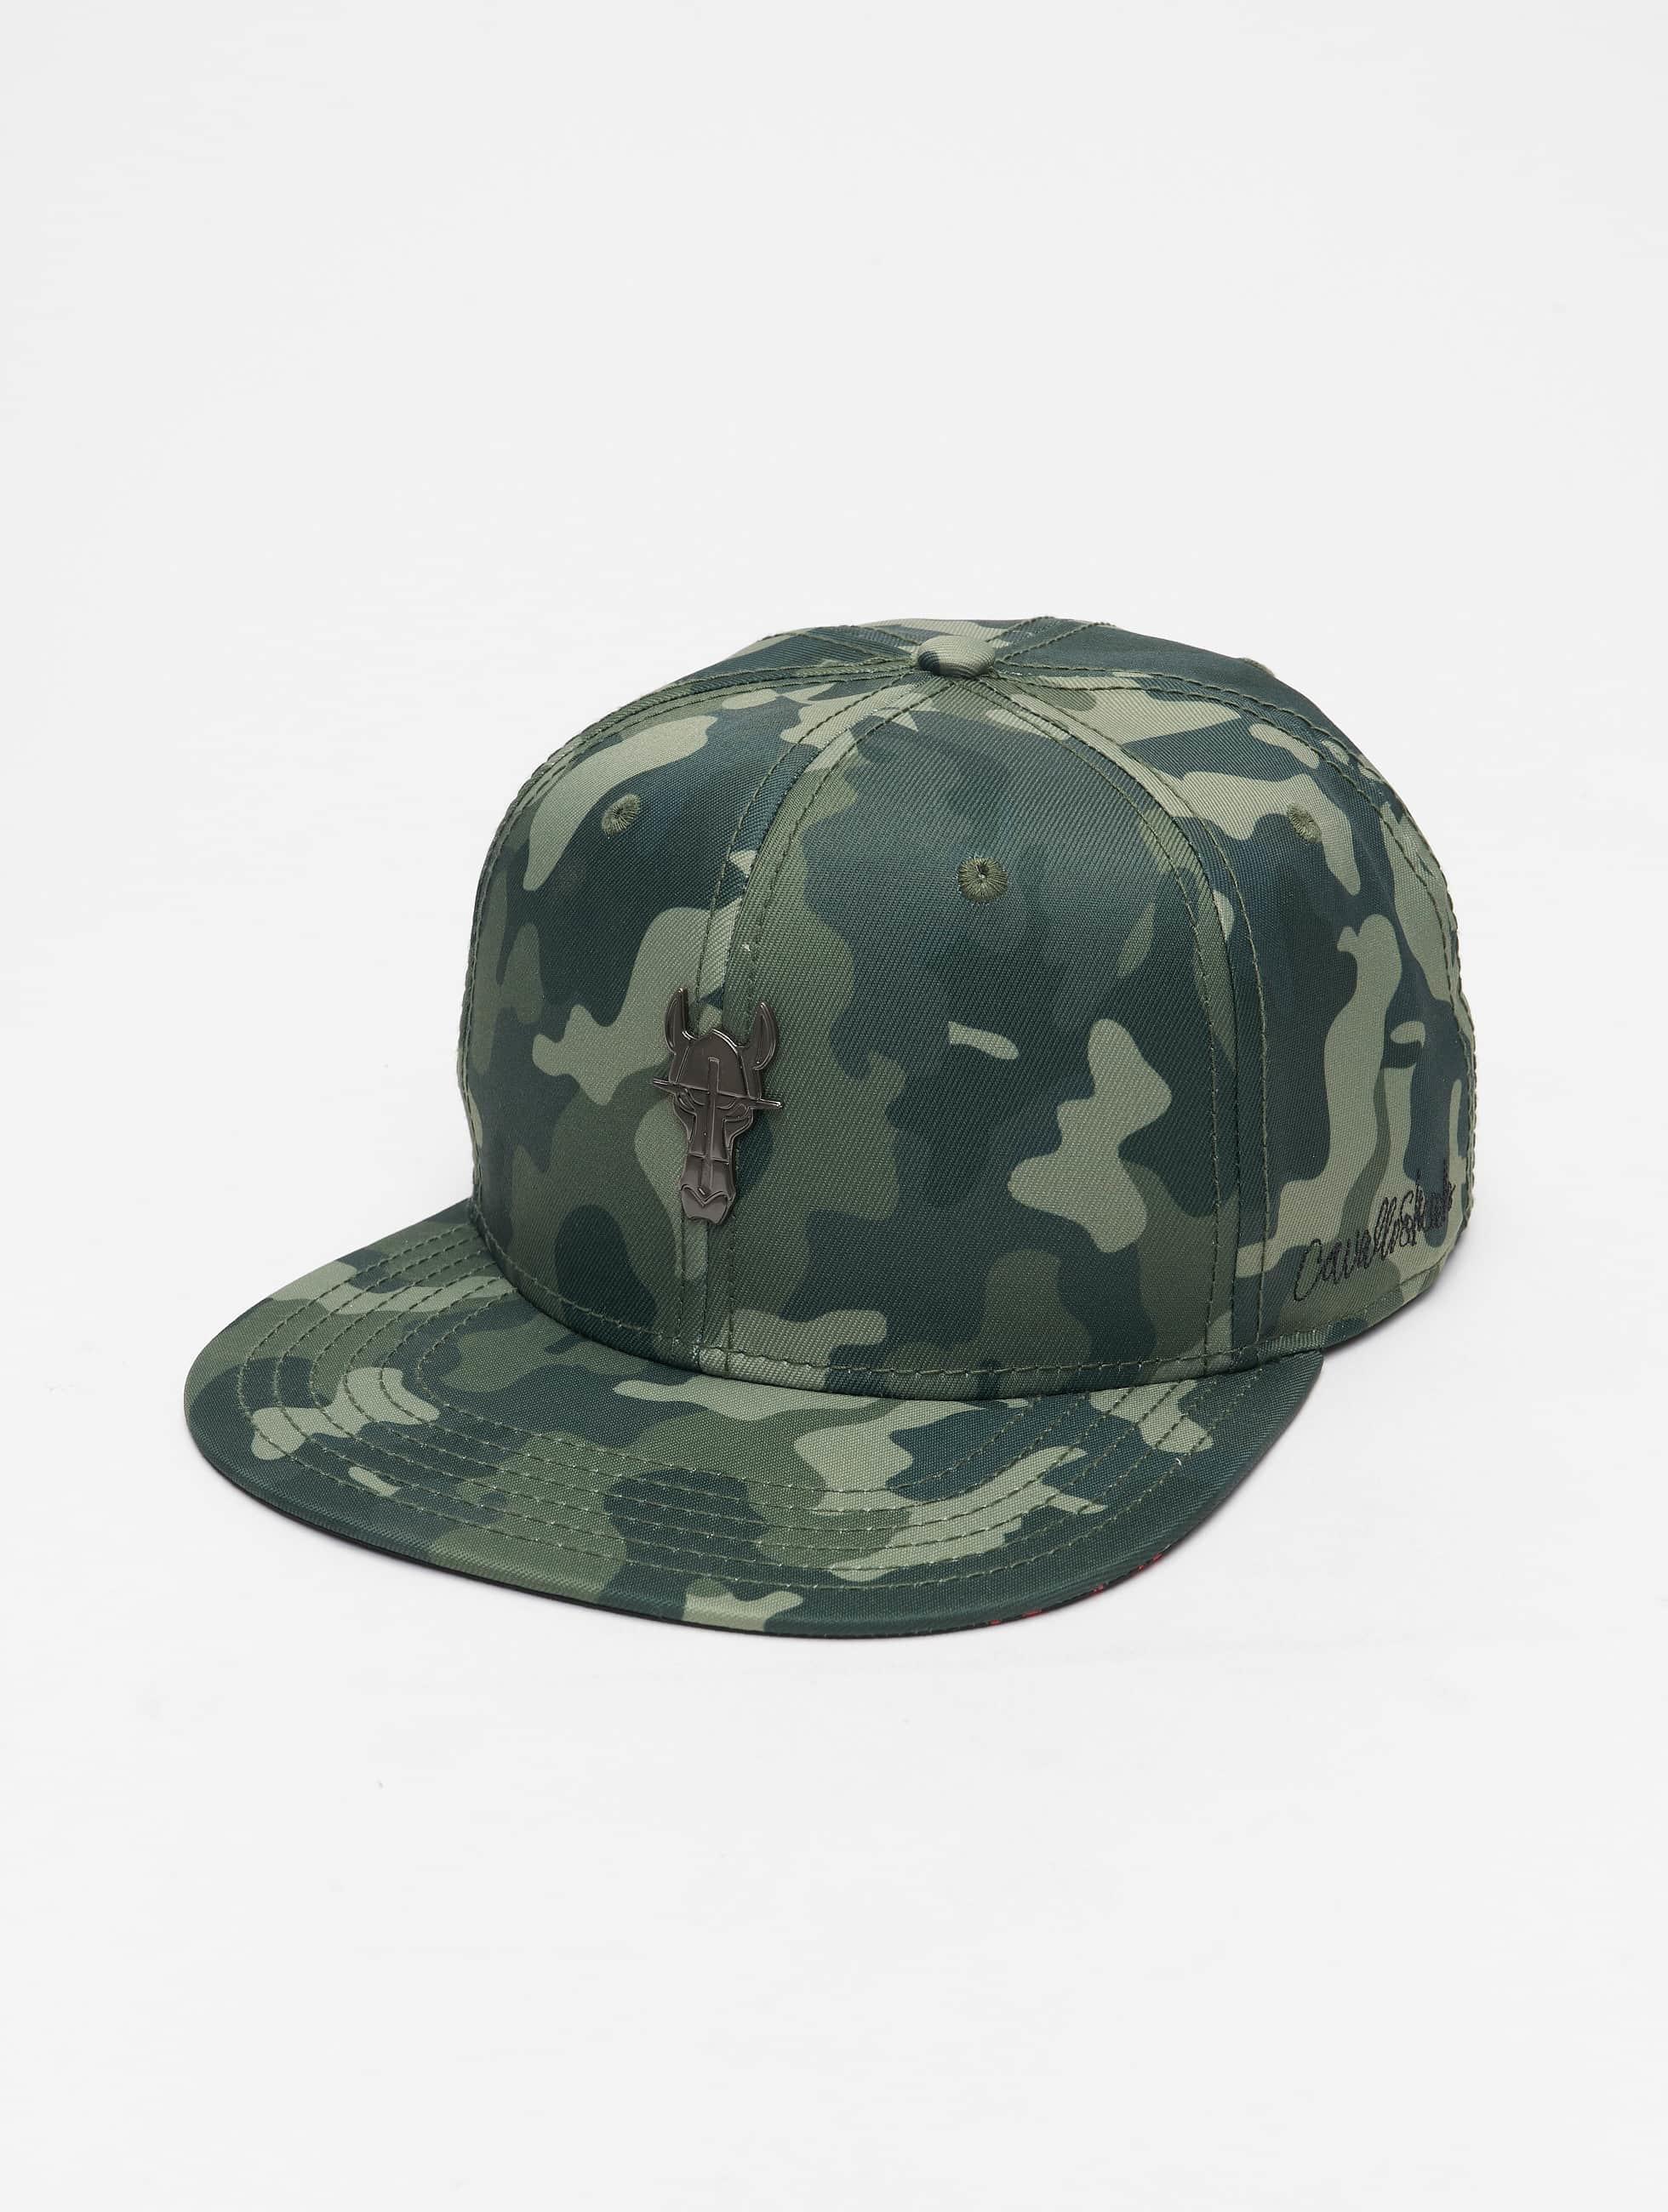 Cavallo de Ferro / Snapback Cap Fire in camouflage Adjustable